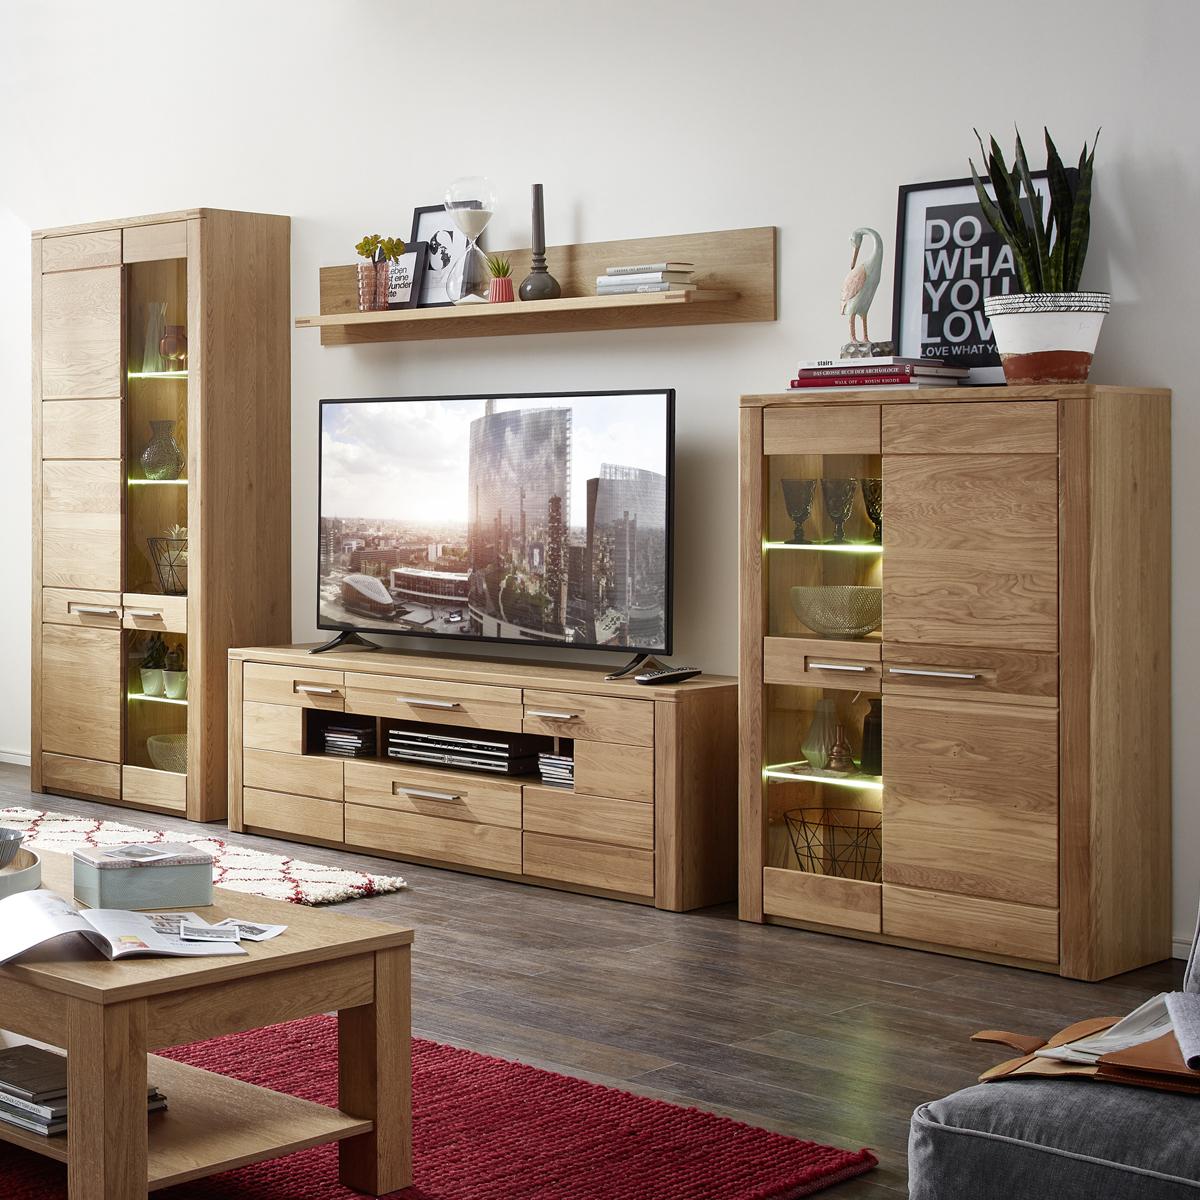 wohnwand nature two mit led anbauwand in wildeiche bianco teilmassiv ebay. Black Bedroom Furniture Sets. Home Design Ideas